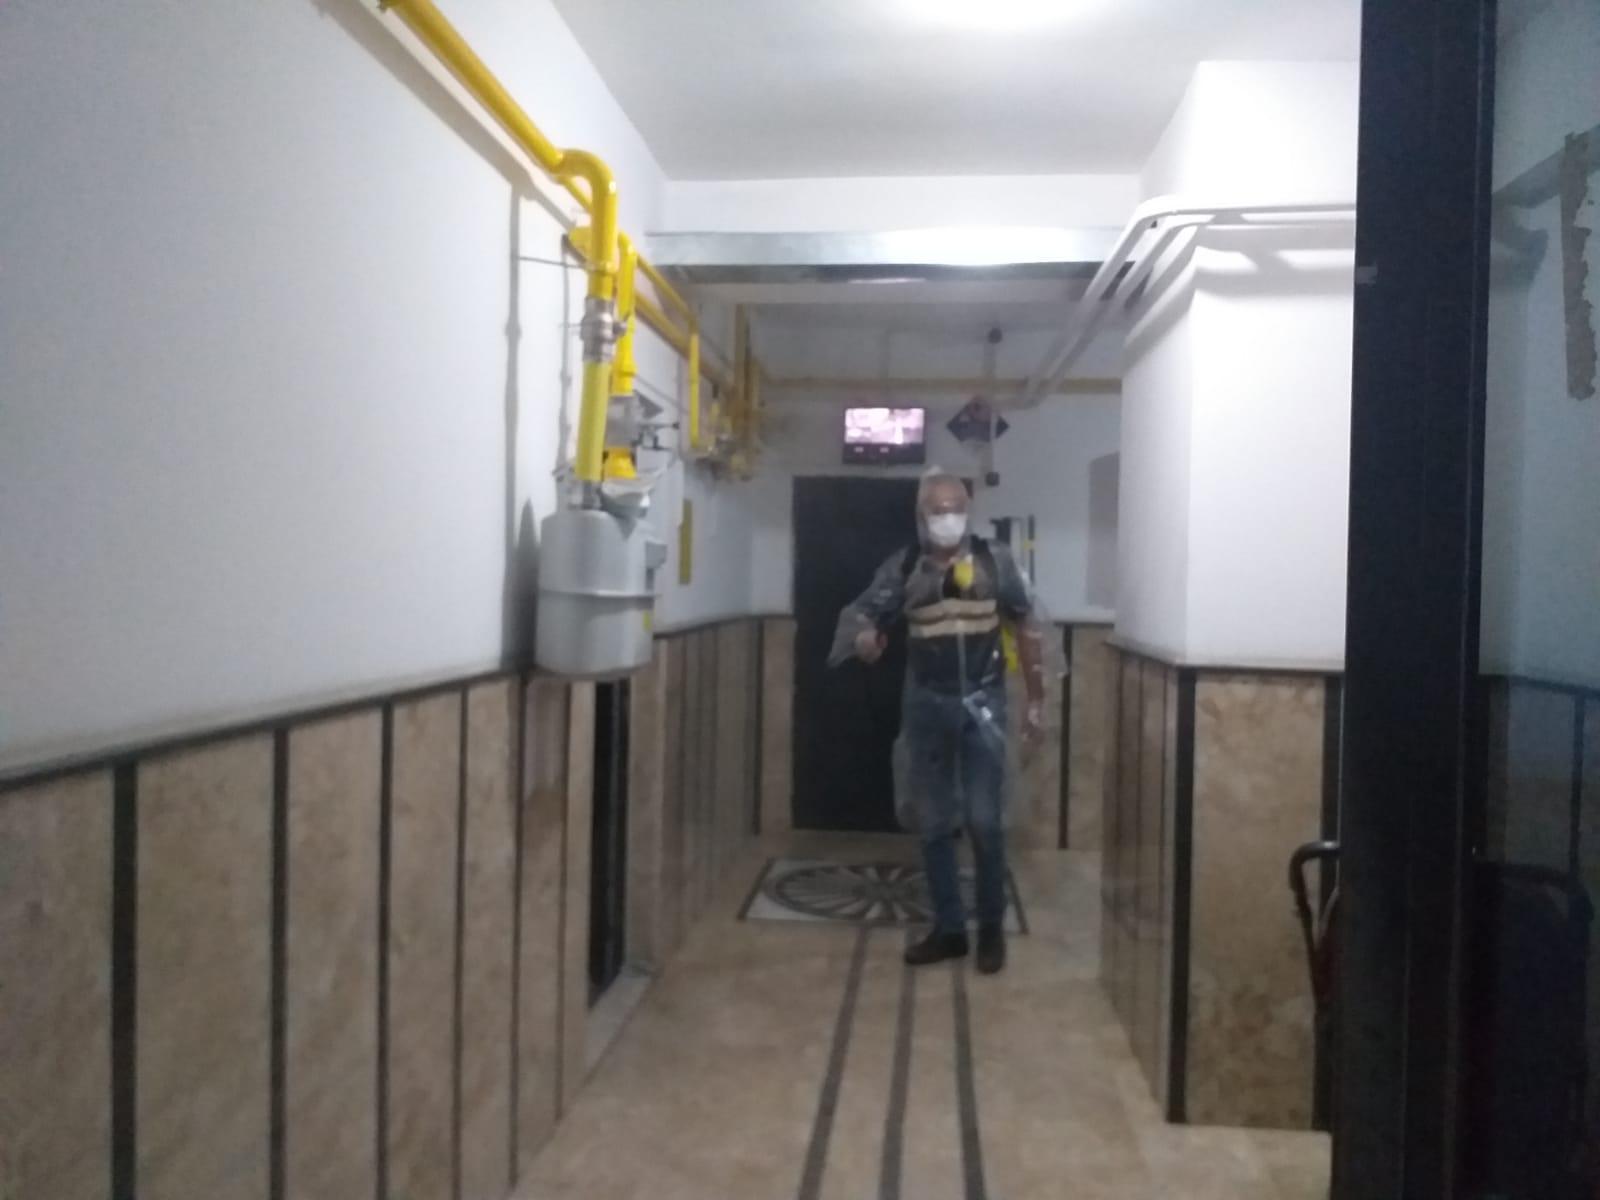 Konya Seydişehir'de 1 apartman, karantinaya alındı